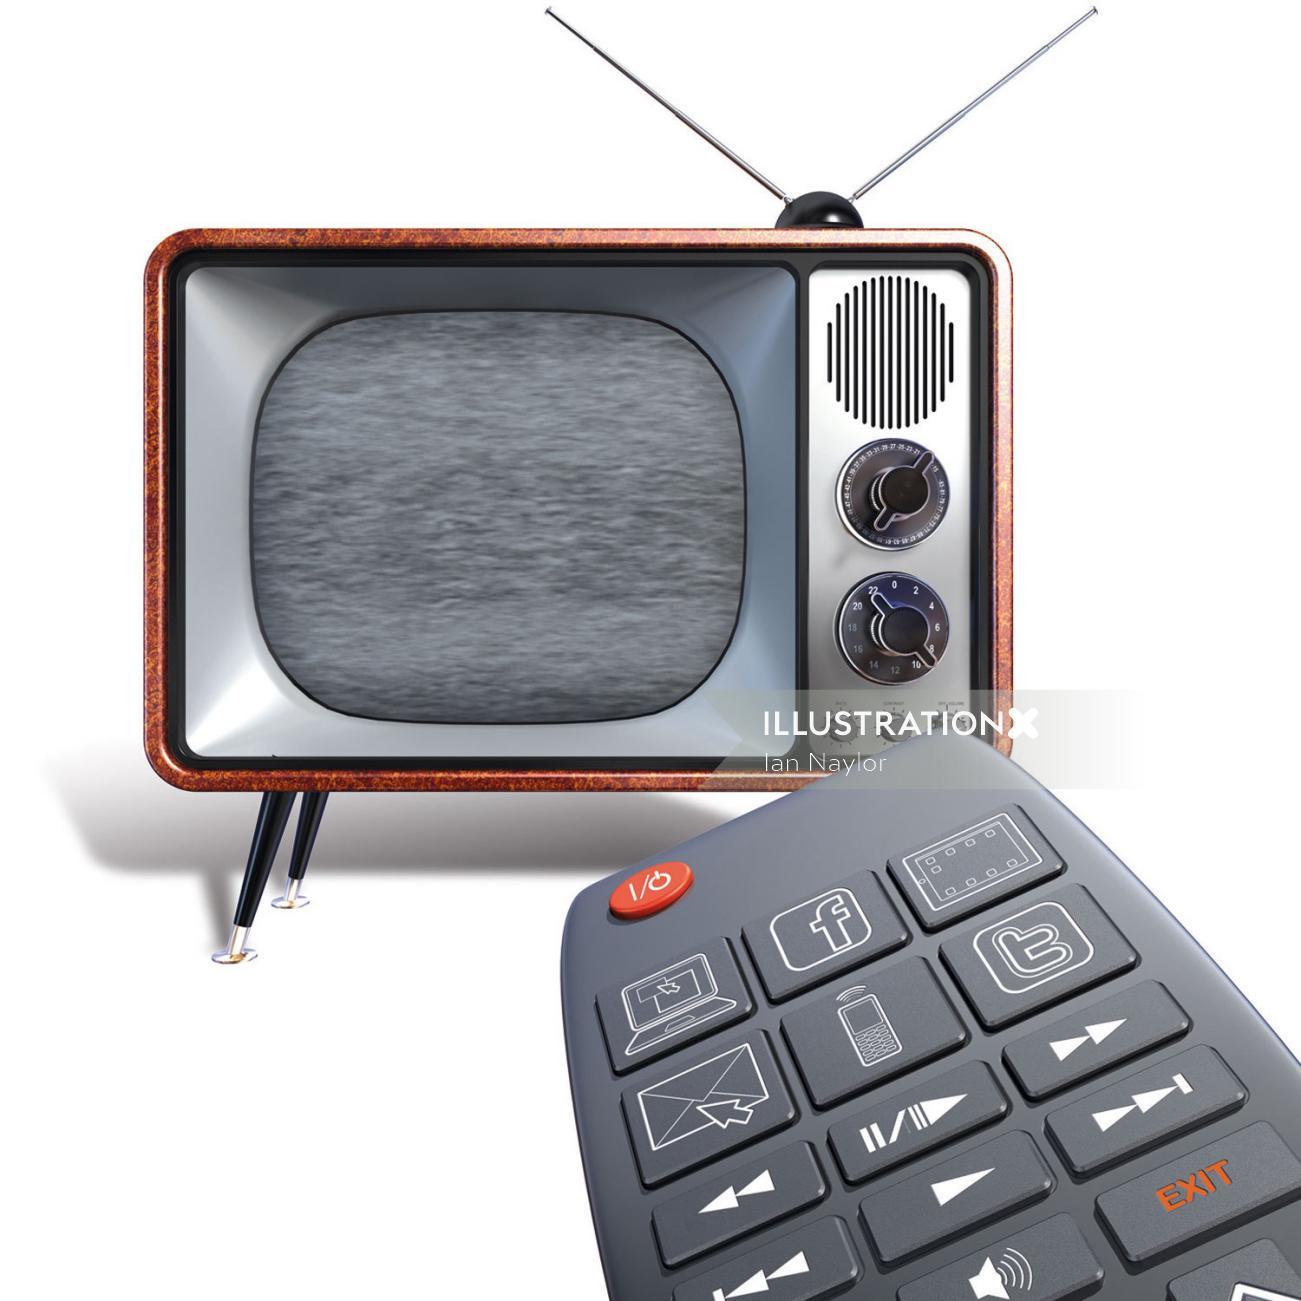 Vintage tv illustration by Ian Naylor